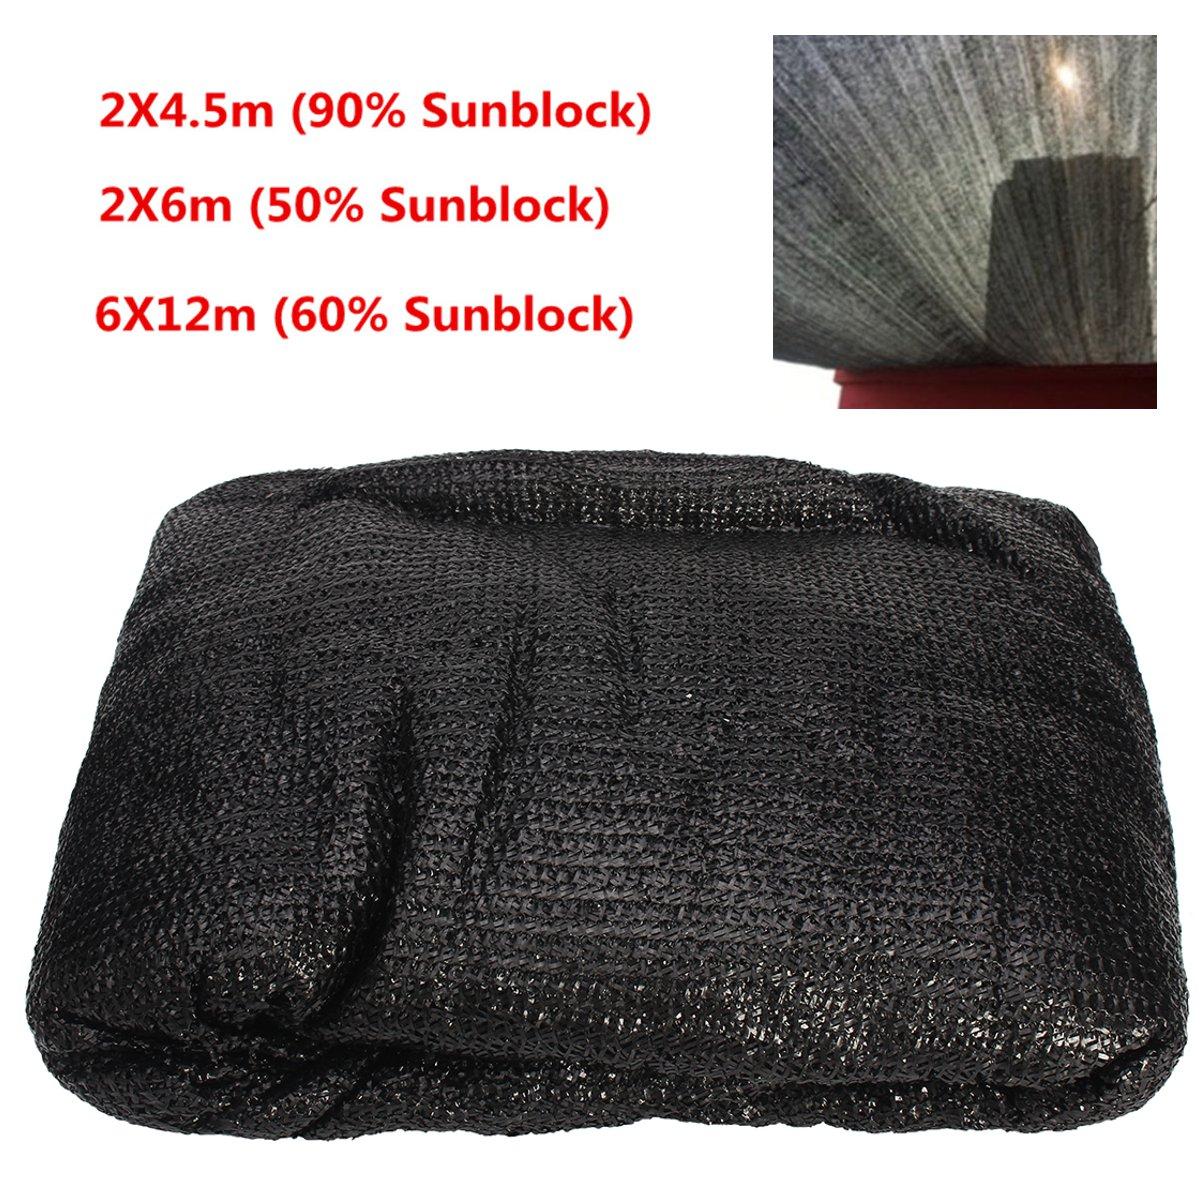 50-90-Sunblock-Shade-Cloth-UV-Resistant-Fabric-Tarp-Barn-Greenhouse-Plant-Cover